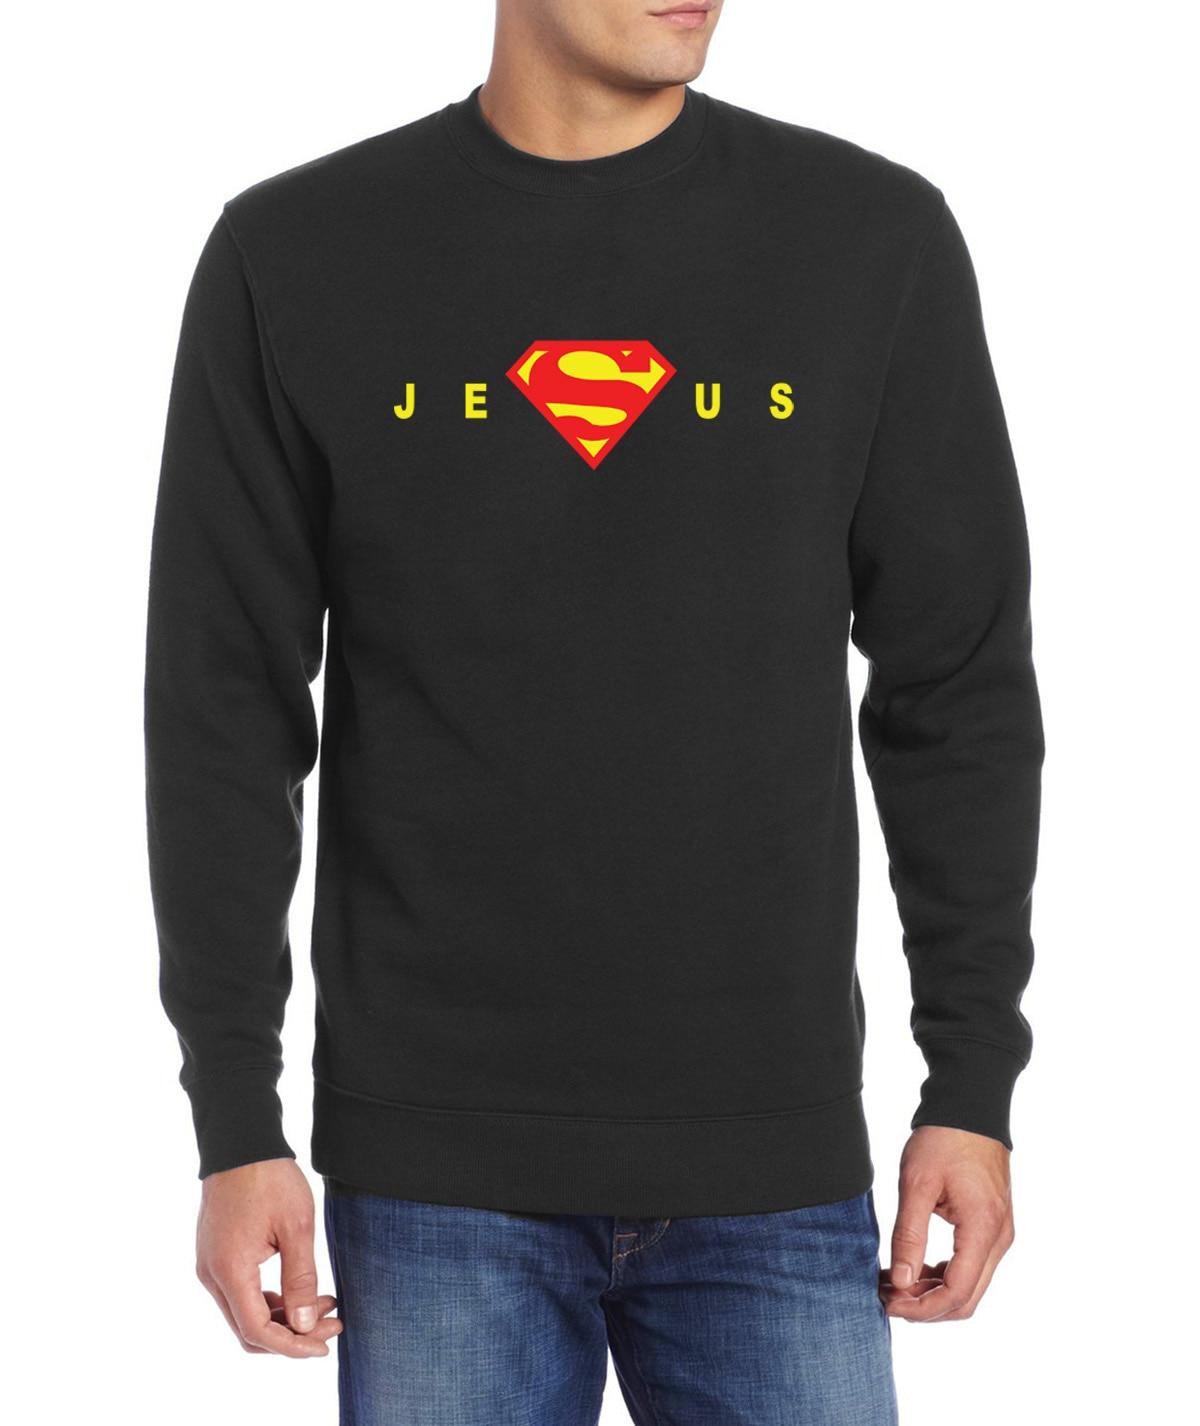 Jesus sweatshirt 2019 men harajuku hip-hop hoodies fashion hoody mma kpop brand tracksuit casual top  pullover